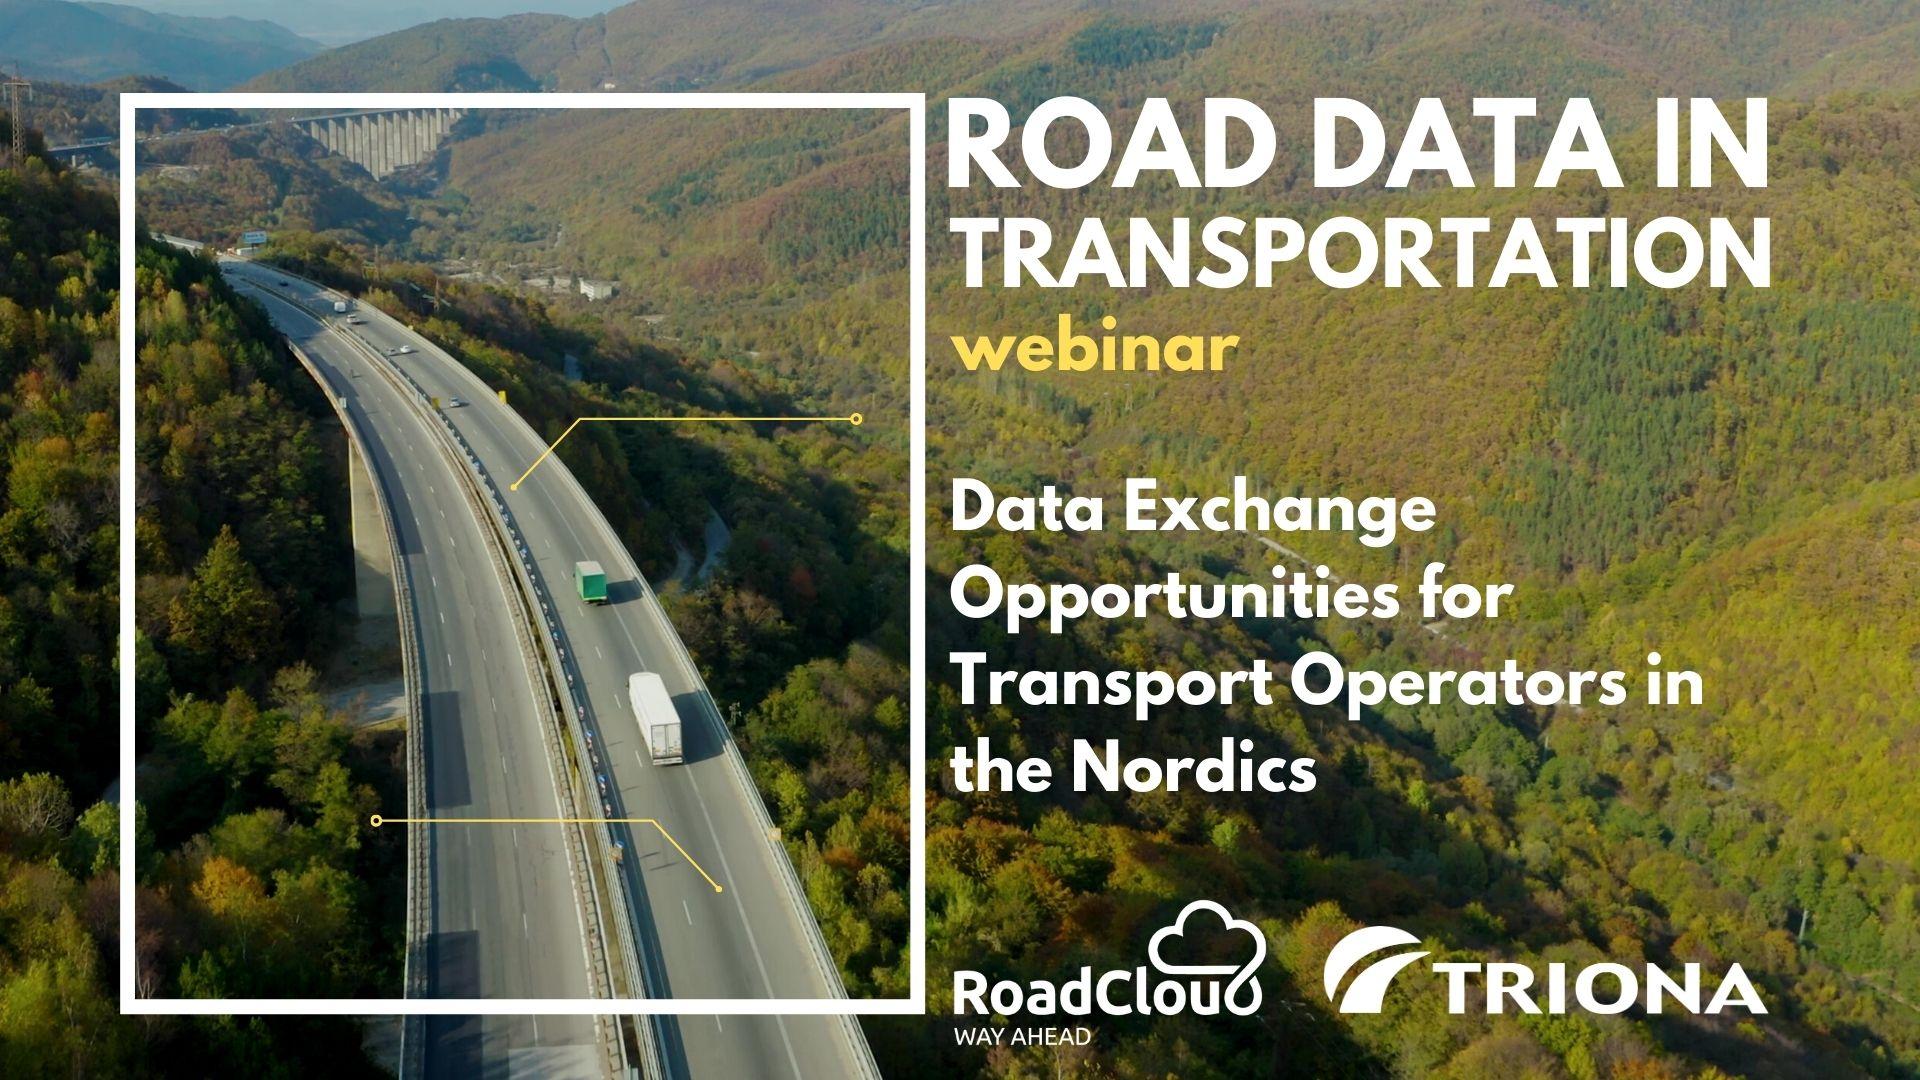 Data Exchange Opportunities for Transport Operators in the Nordics